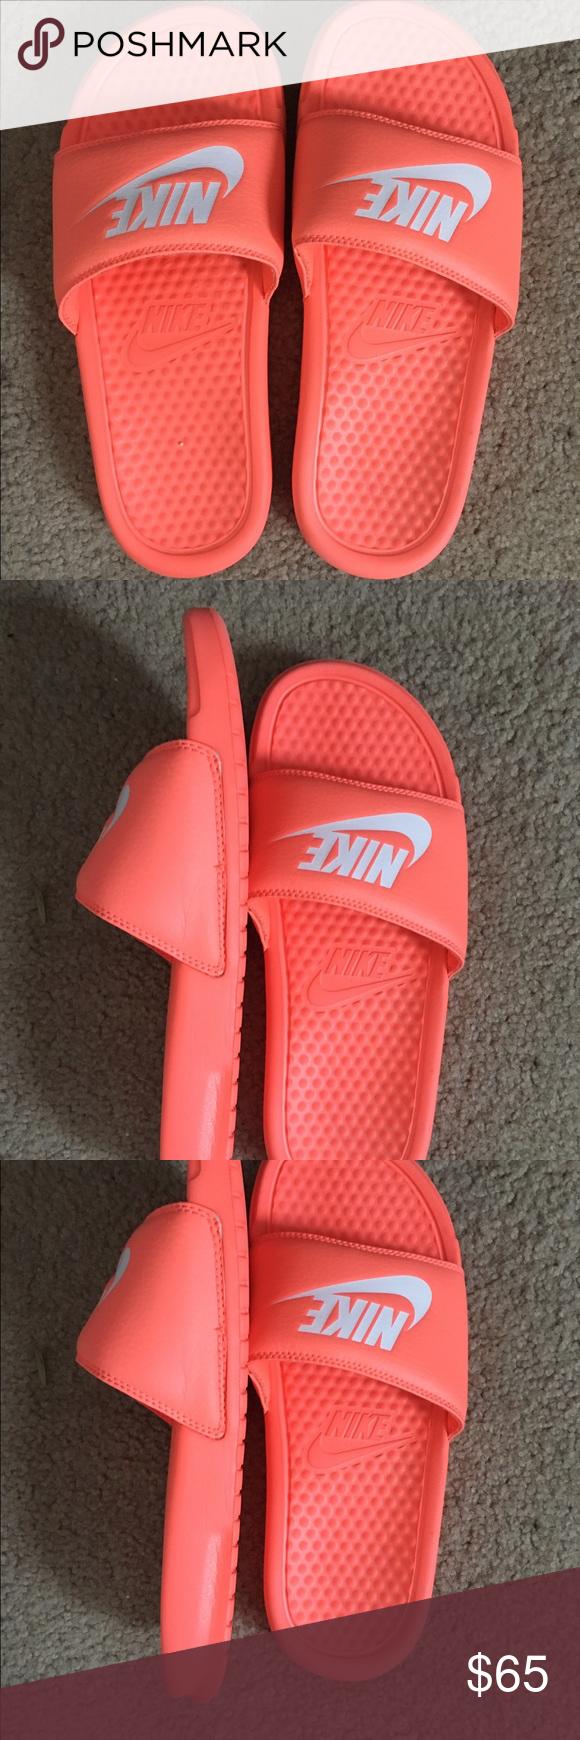 5e41a974fd5506 Nike orange core mango slides white Nike logo These super cute Nike slip on  shoes are